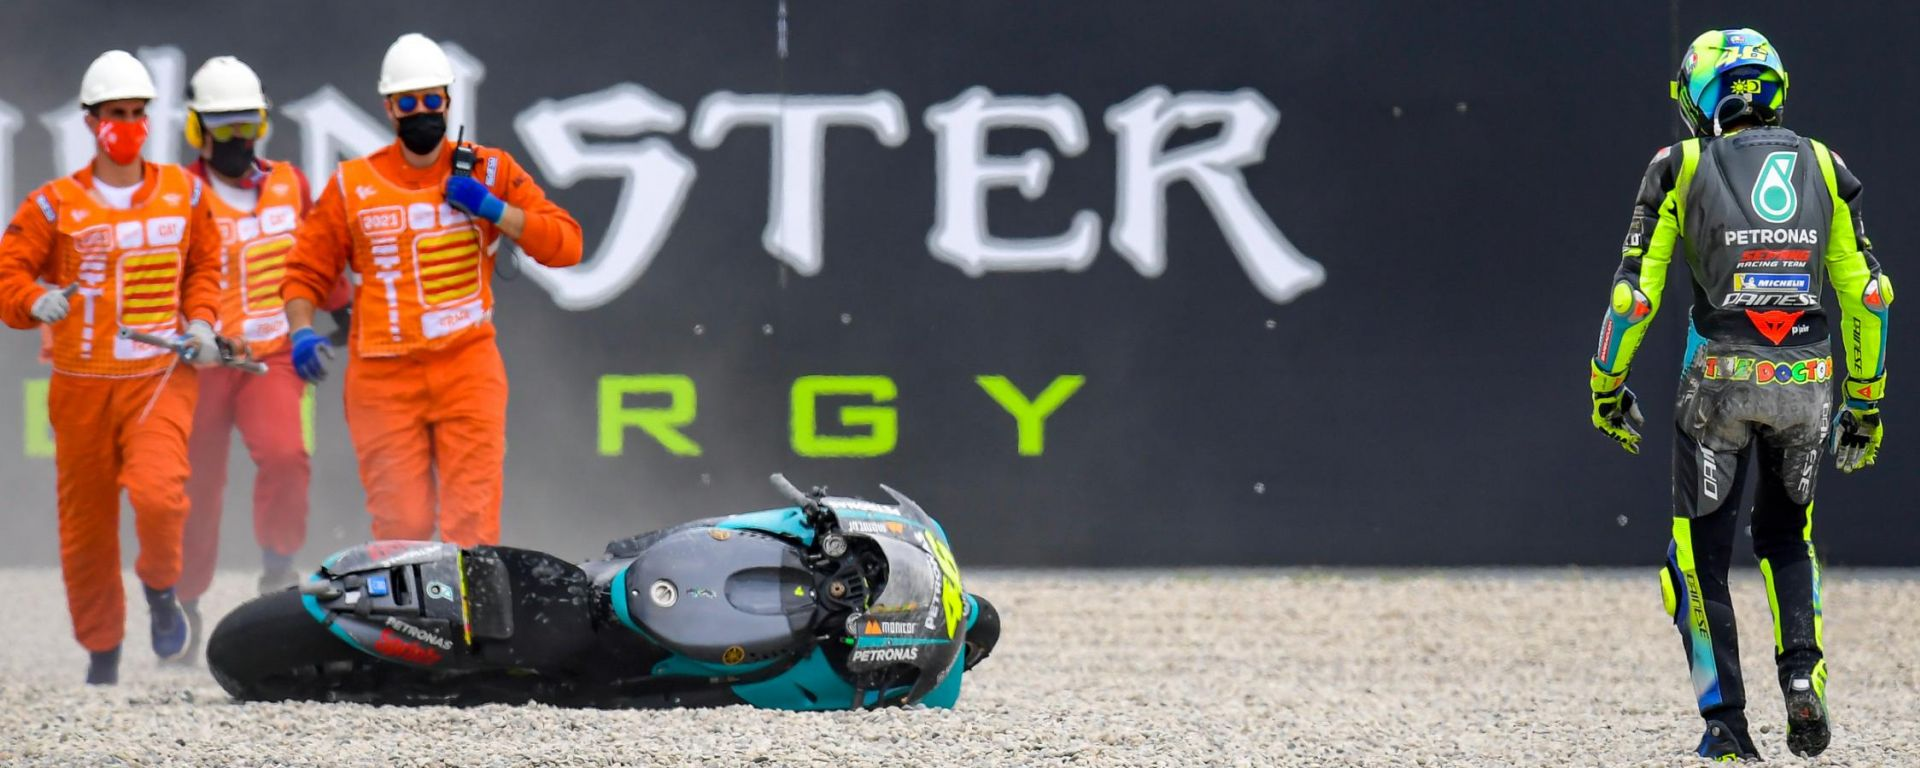 MotoGP Catalunya 2021, Valentino Rossi (Yamaha Petronas SRT) scivolato nella ghiaia